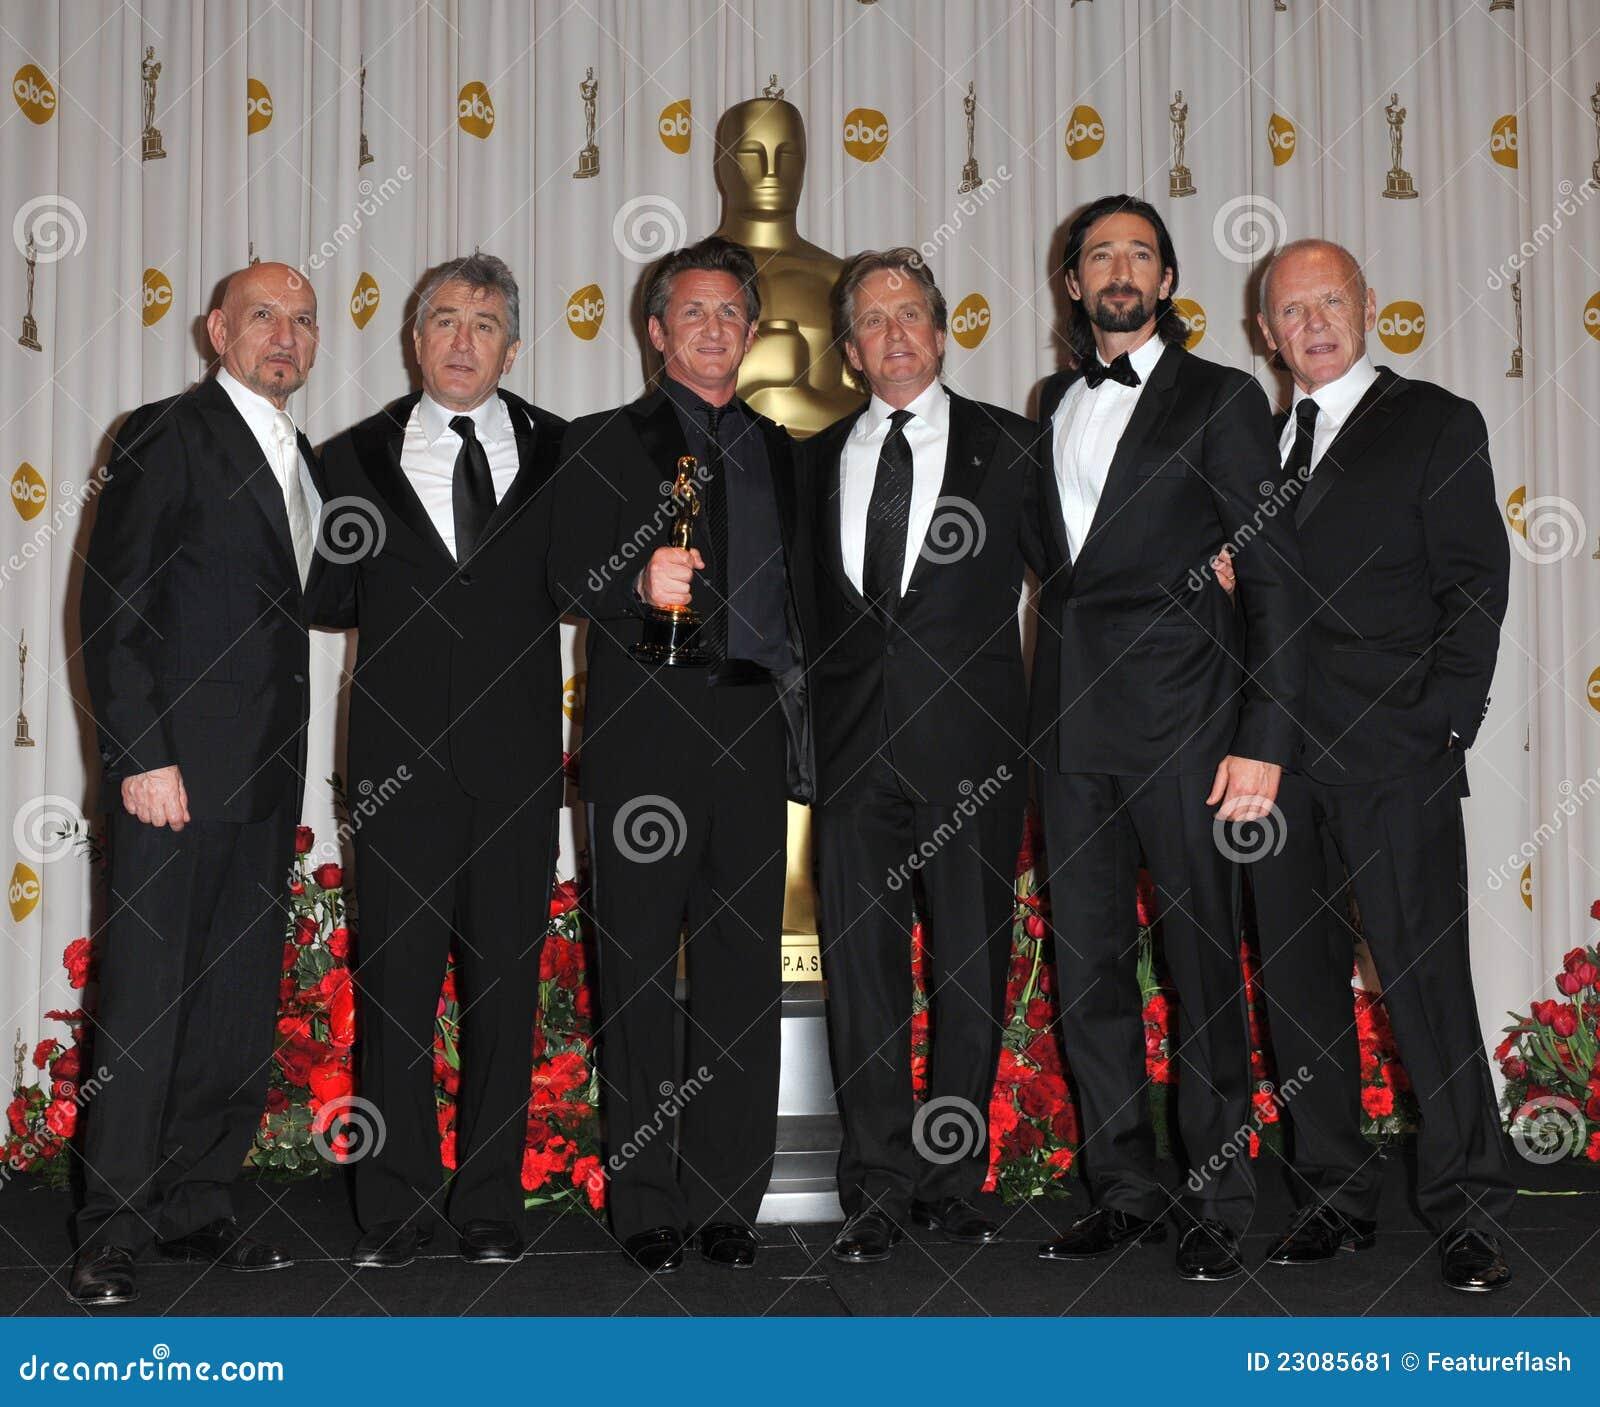 Adrien Anthony Ben brody De Douglas hopkins kingsley Michael Niro penn Robert Sean